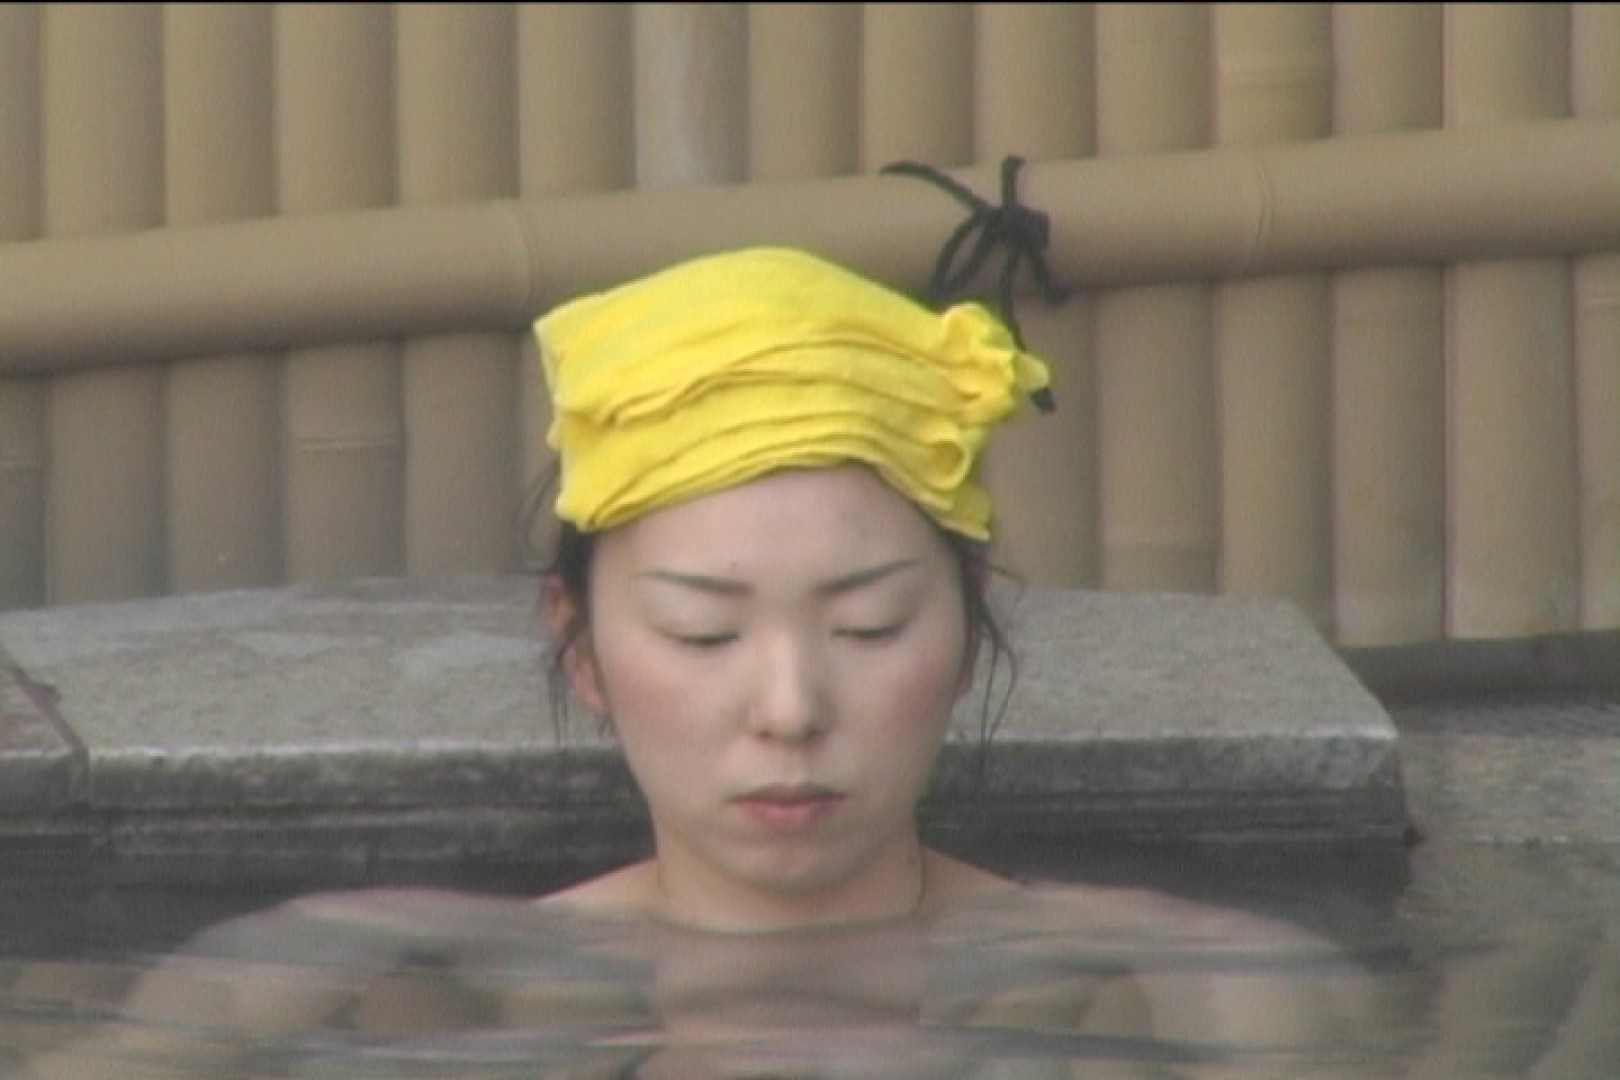 Aquaな露天風呂Vol.529 盗撮シリーズ | 露天風呂編  106PIX 59